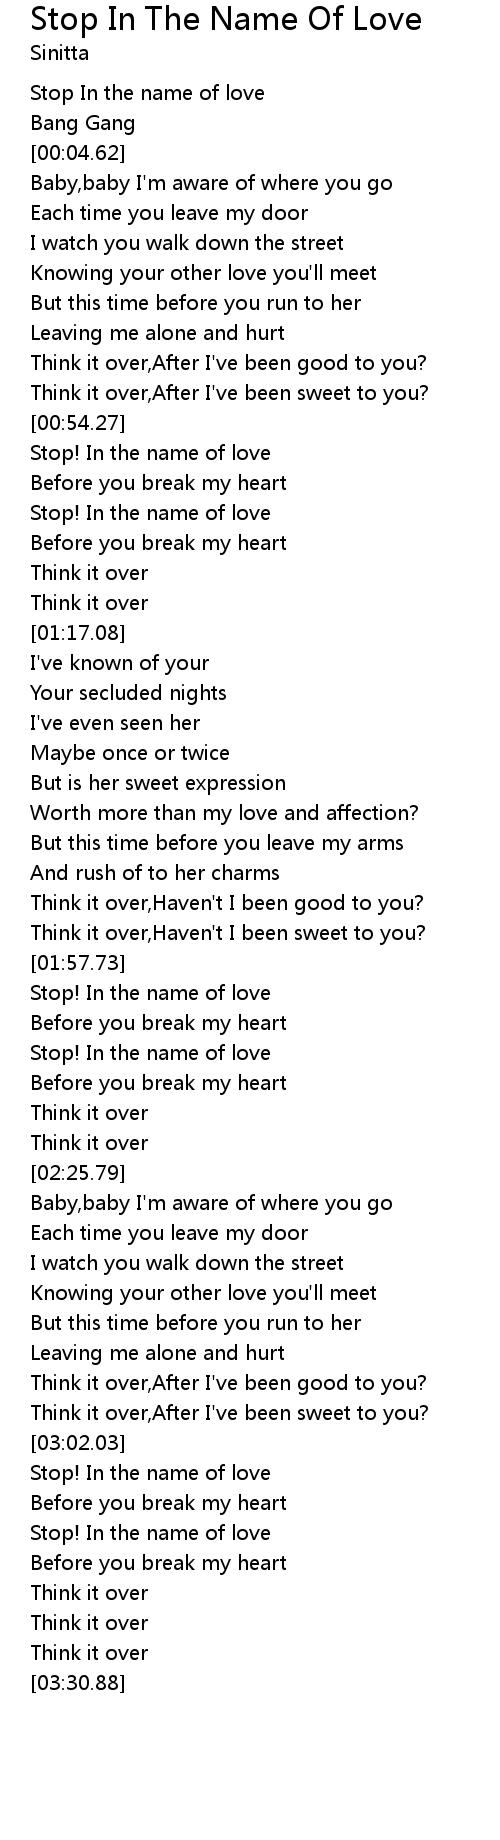 Stop In The Name Of Love Lyrics Follow Lyrics